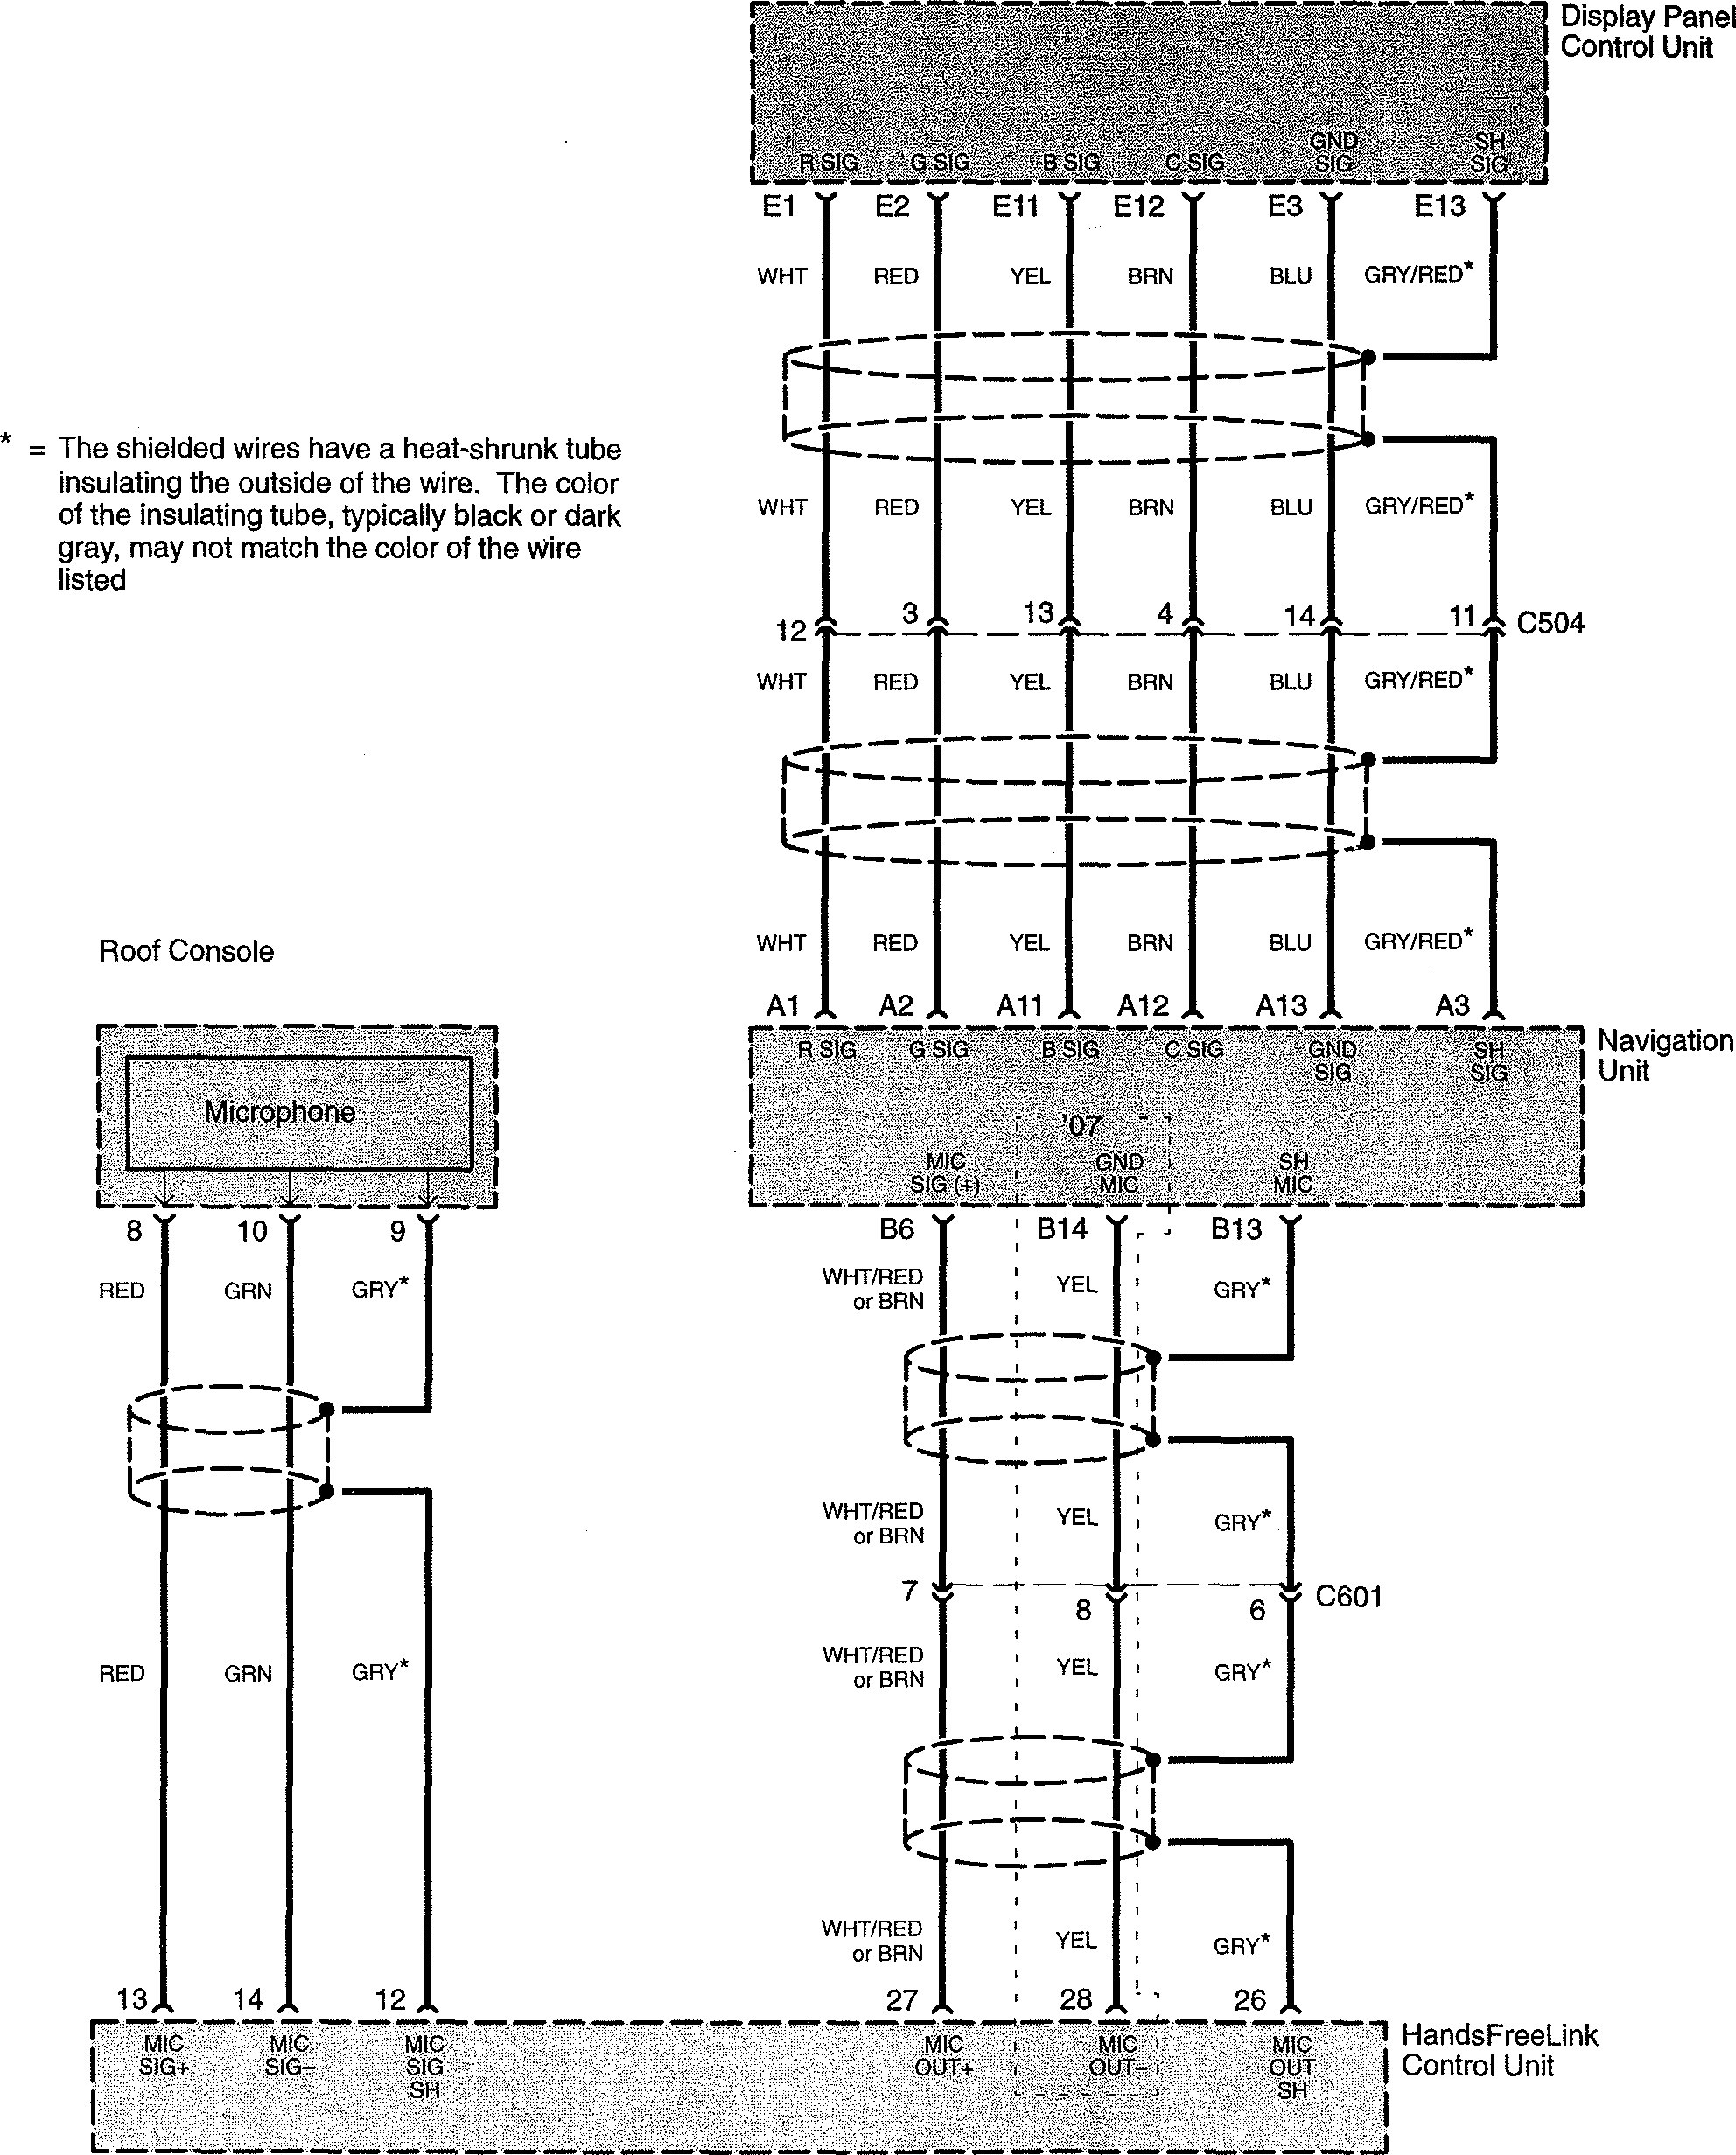 2005 acura tl speaker wiring diagram whirlpool gas range schematics library